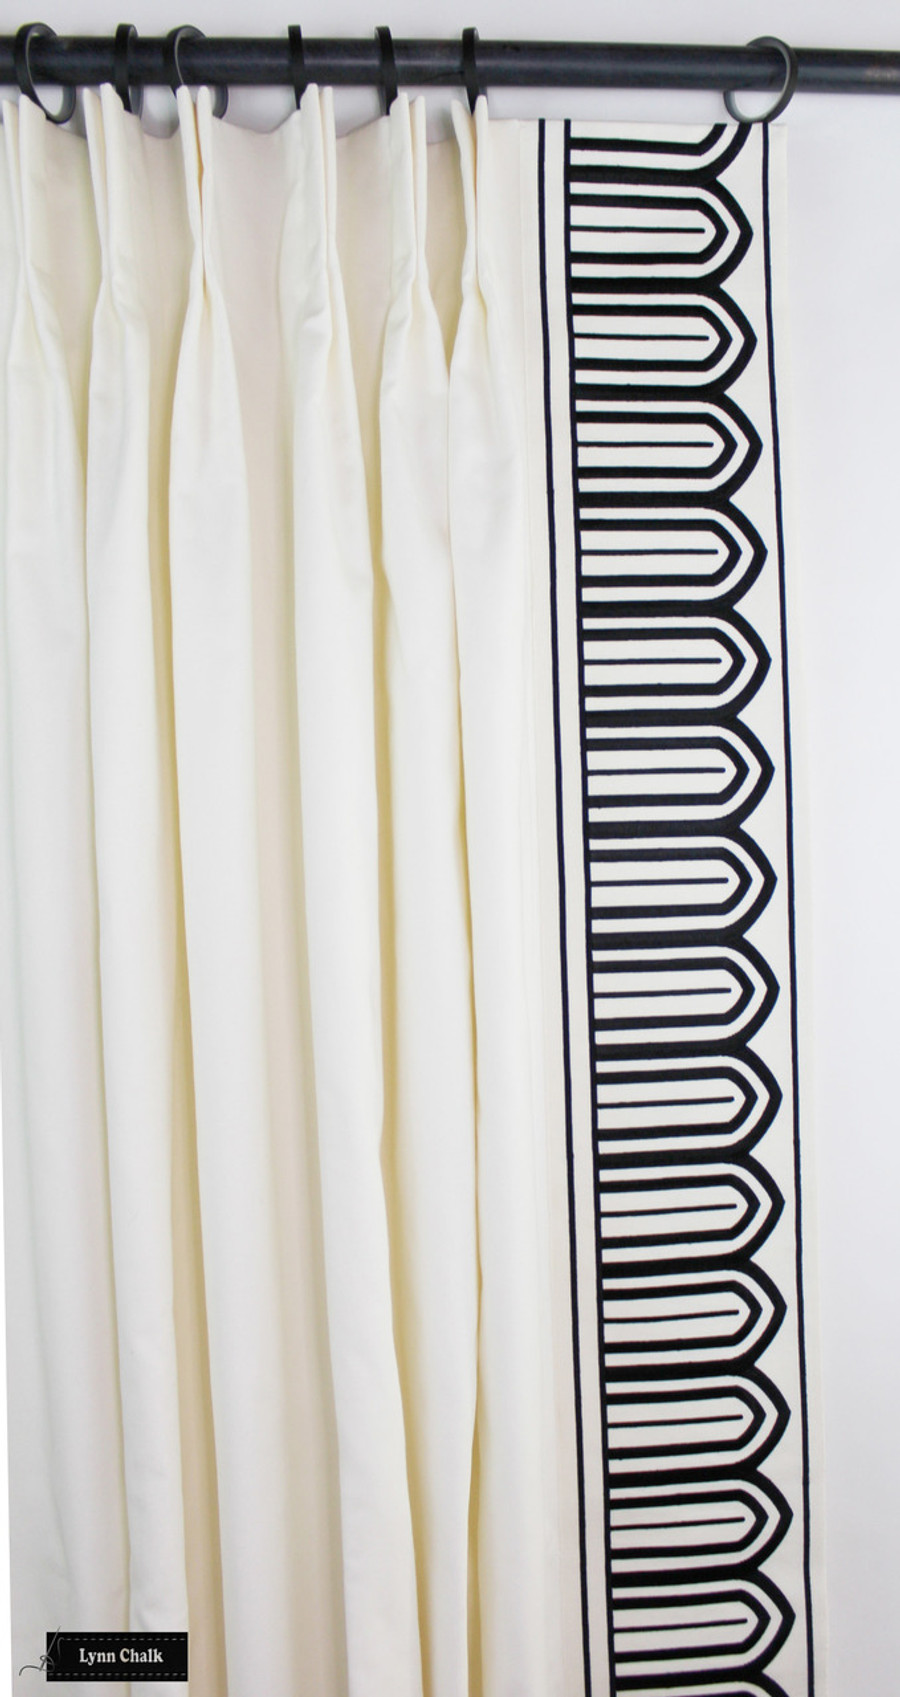 Custom Drapes in Schumacher Elliott in Cream 69492 with Arches 6 Inch Wide Trim Black on White 70770